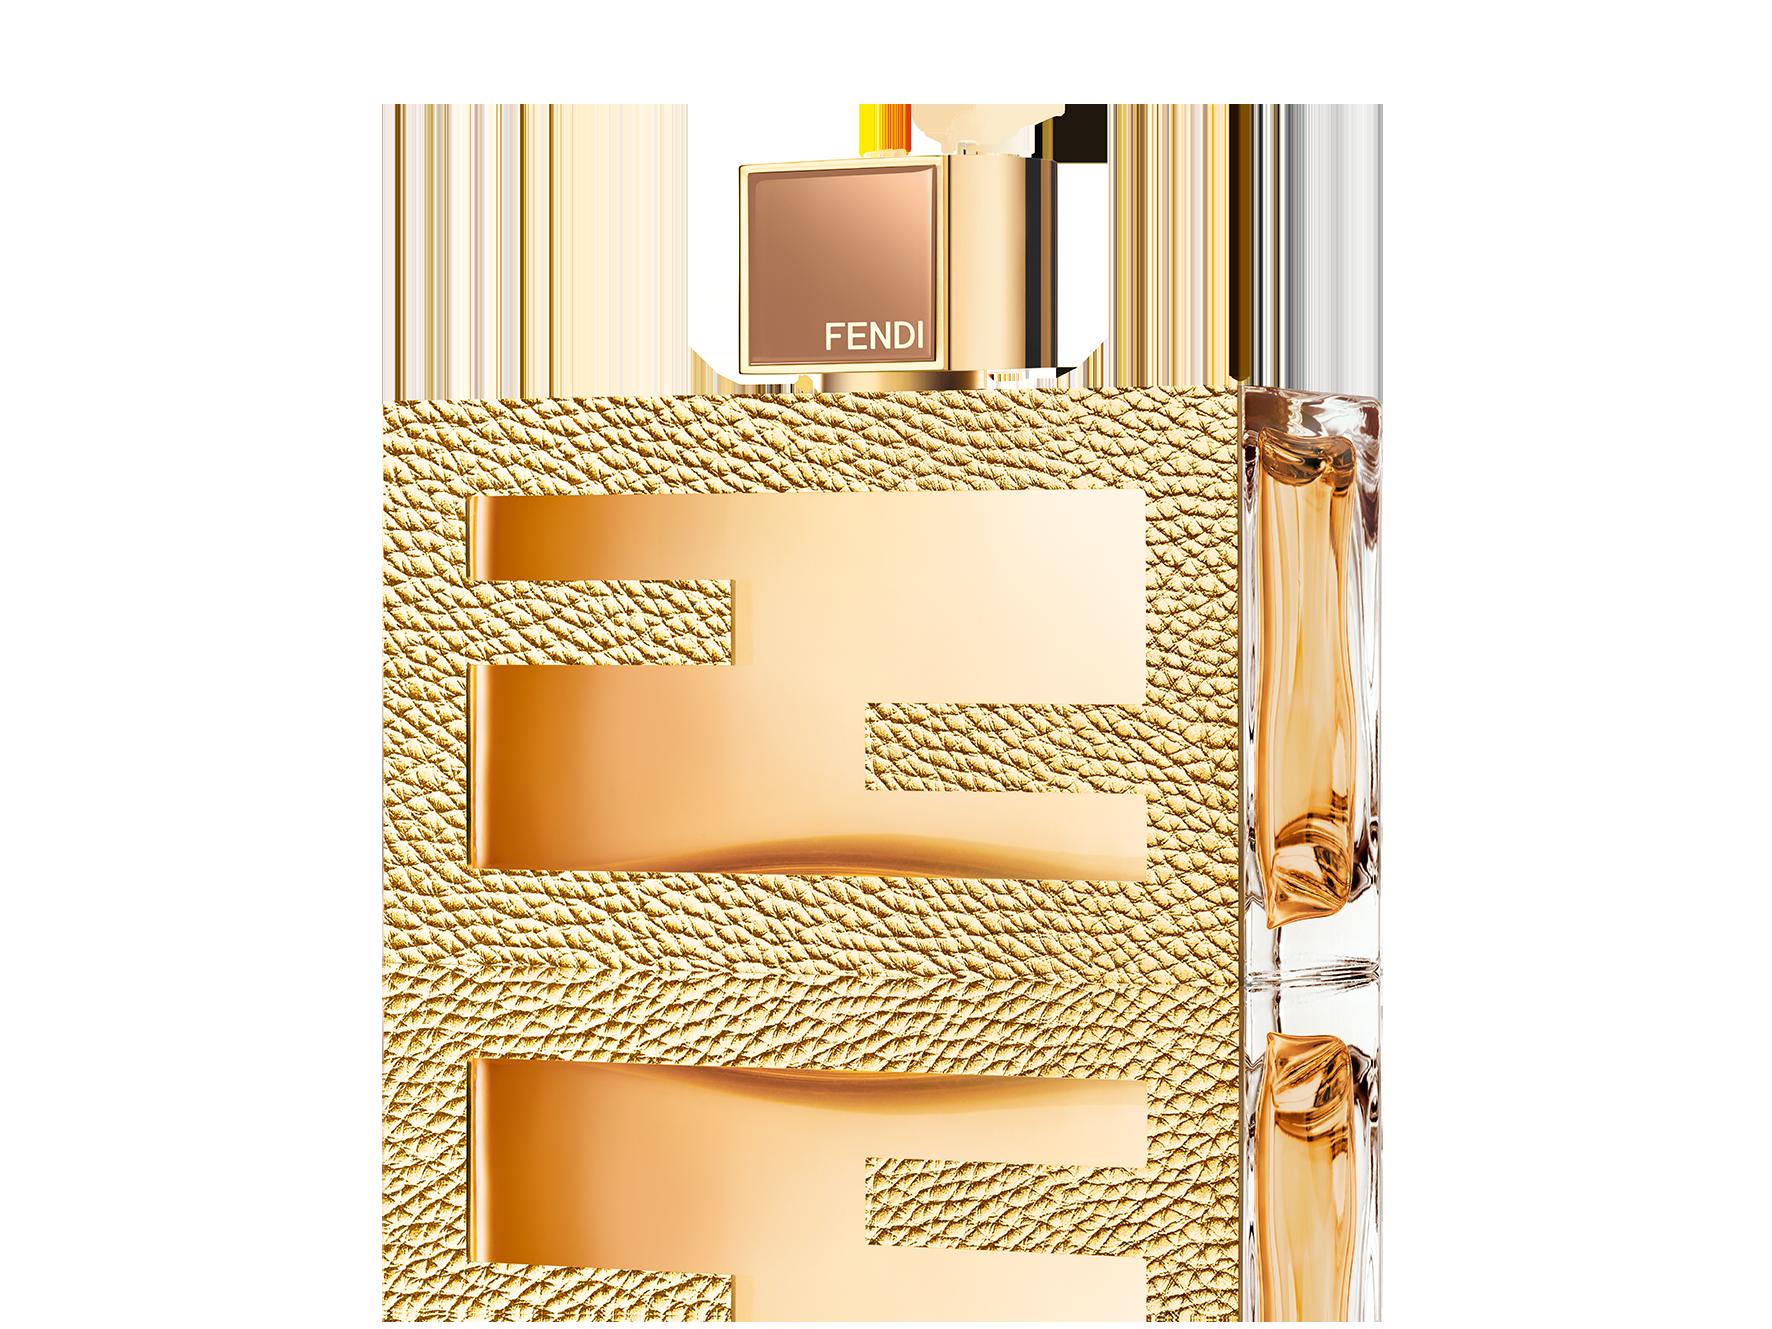 Fan di Fendi Leather Essence | Perfume, Women perfume